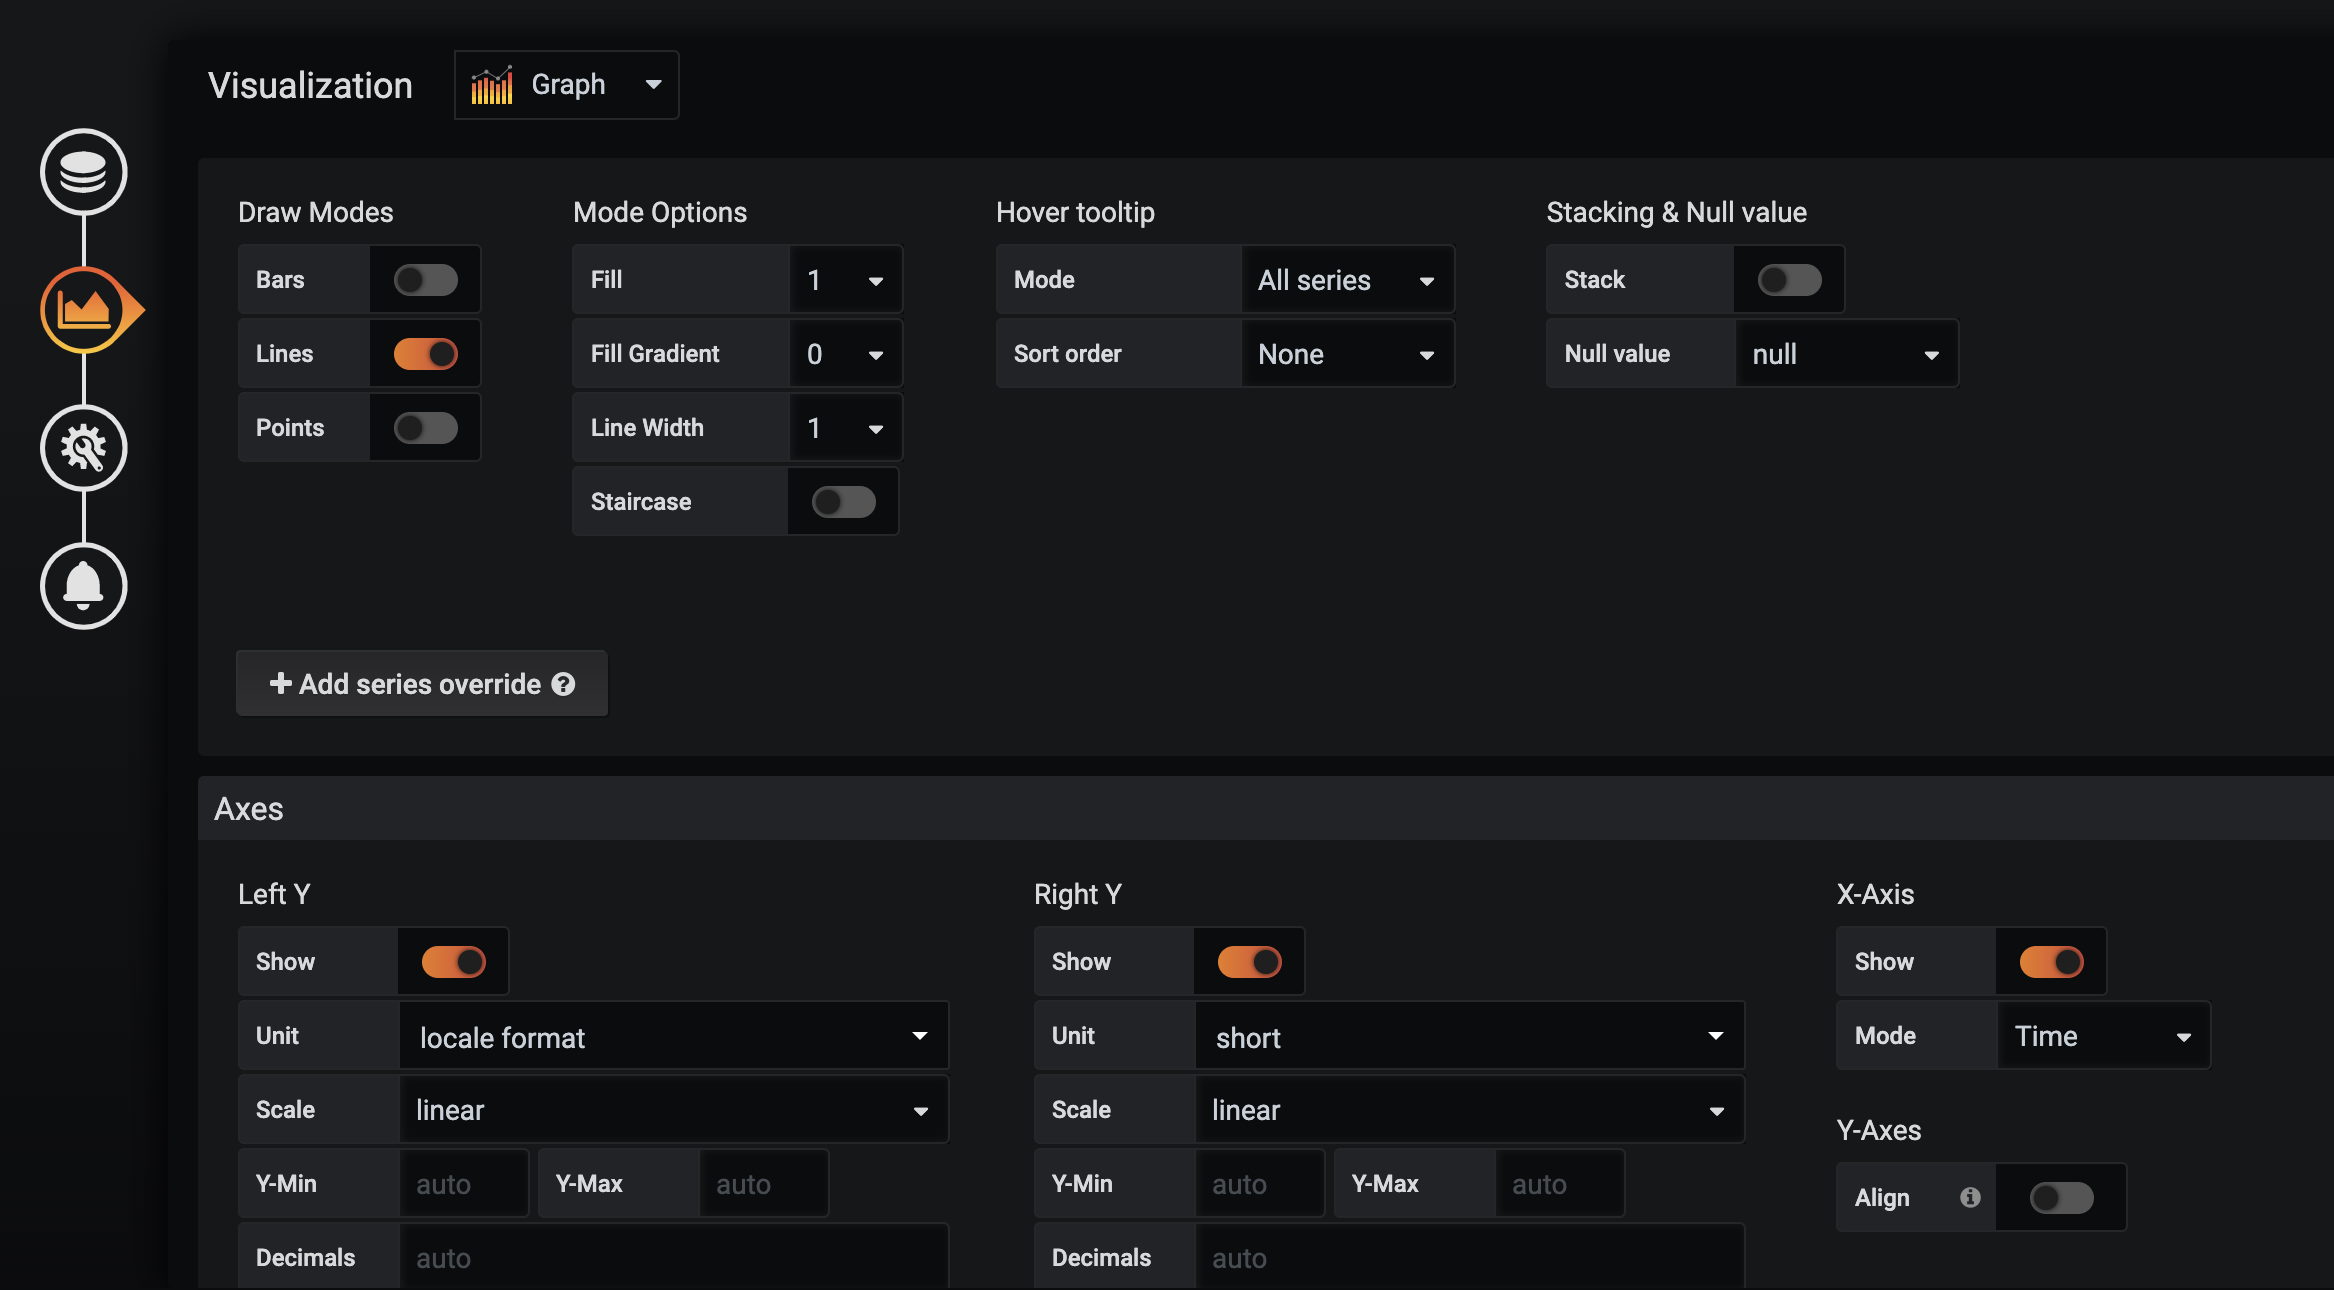 prometheus-grafana-custom-dashboard-setting-panel-detail.png